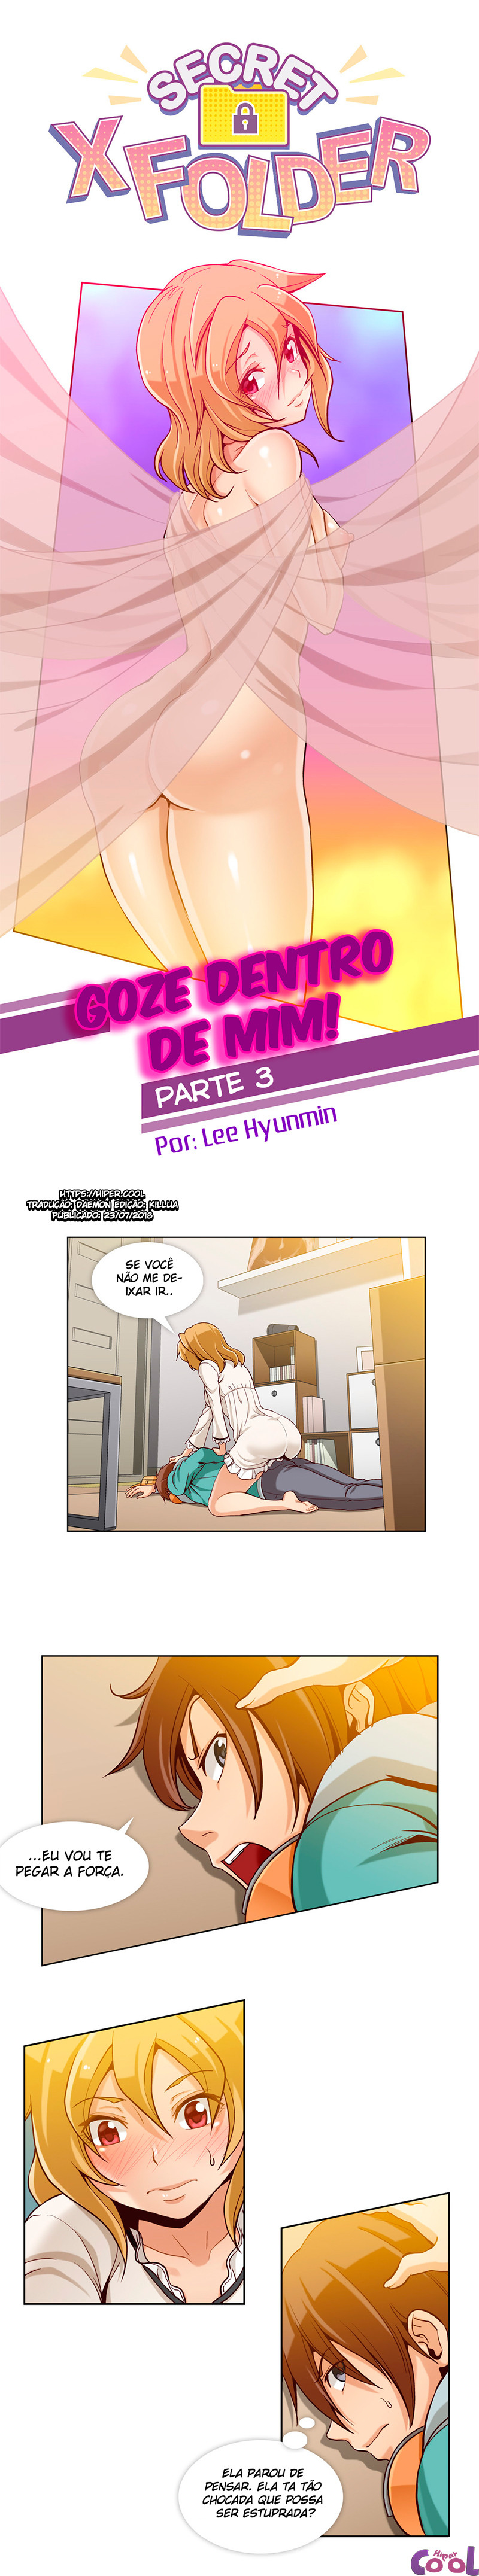 https://nine.mangadogs.com/br_manga/pic/27/5851/6512194/SecretXFolder5_0_205.jpg Page 1